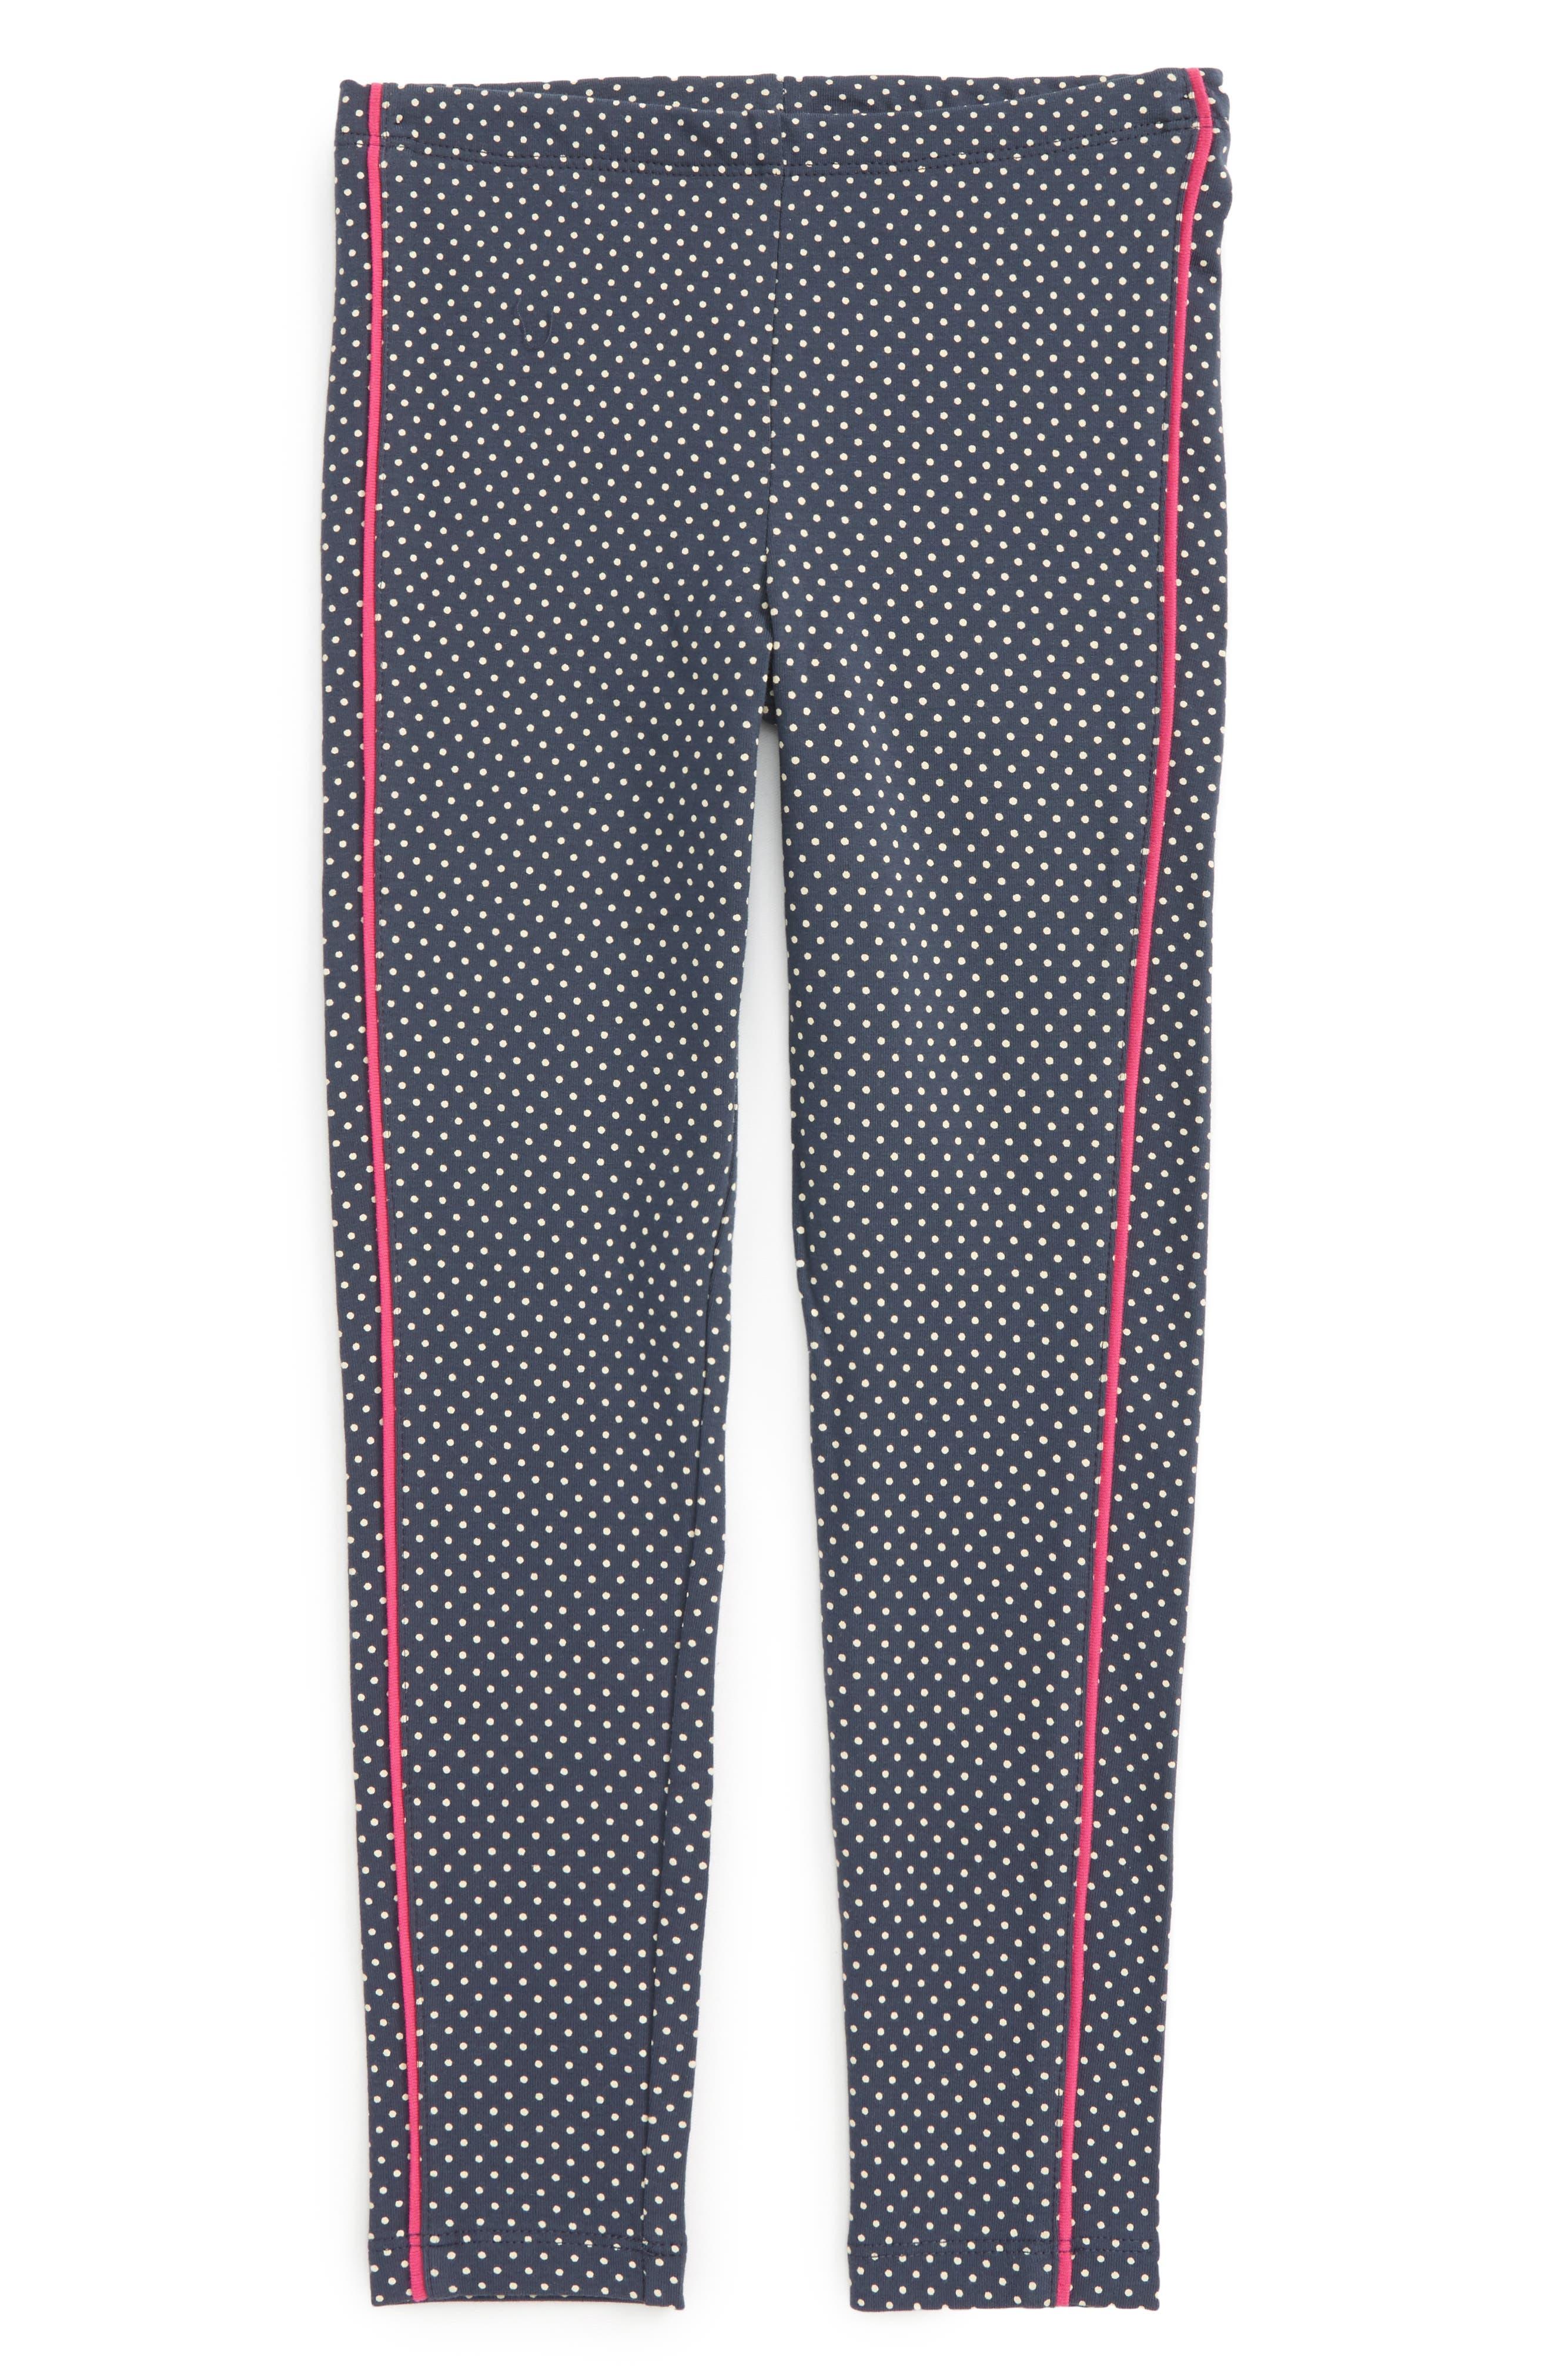 Tea Collection Stripe-n-Dot Leggings (Toddler Girls, Little Girls & Big Girls)